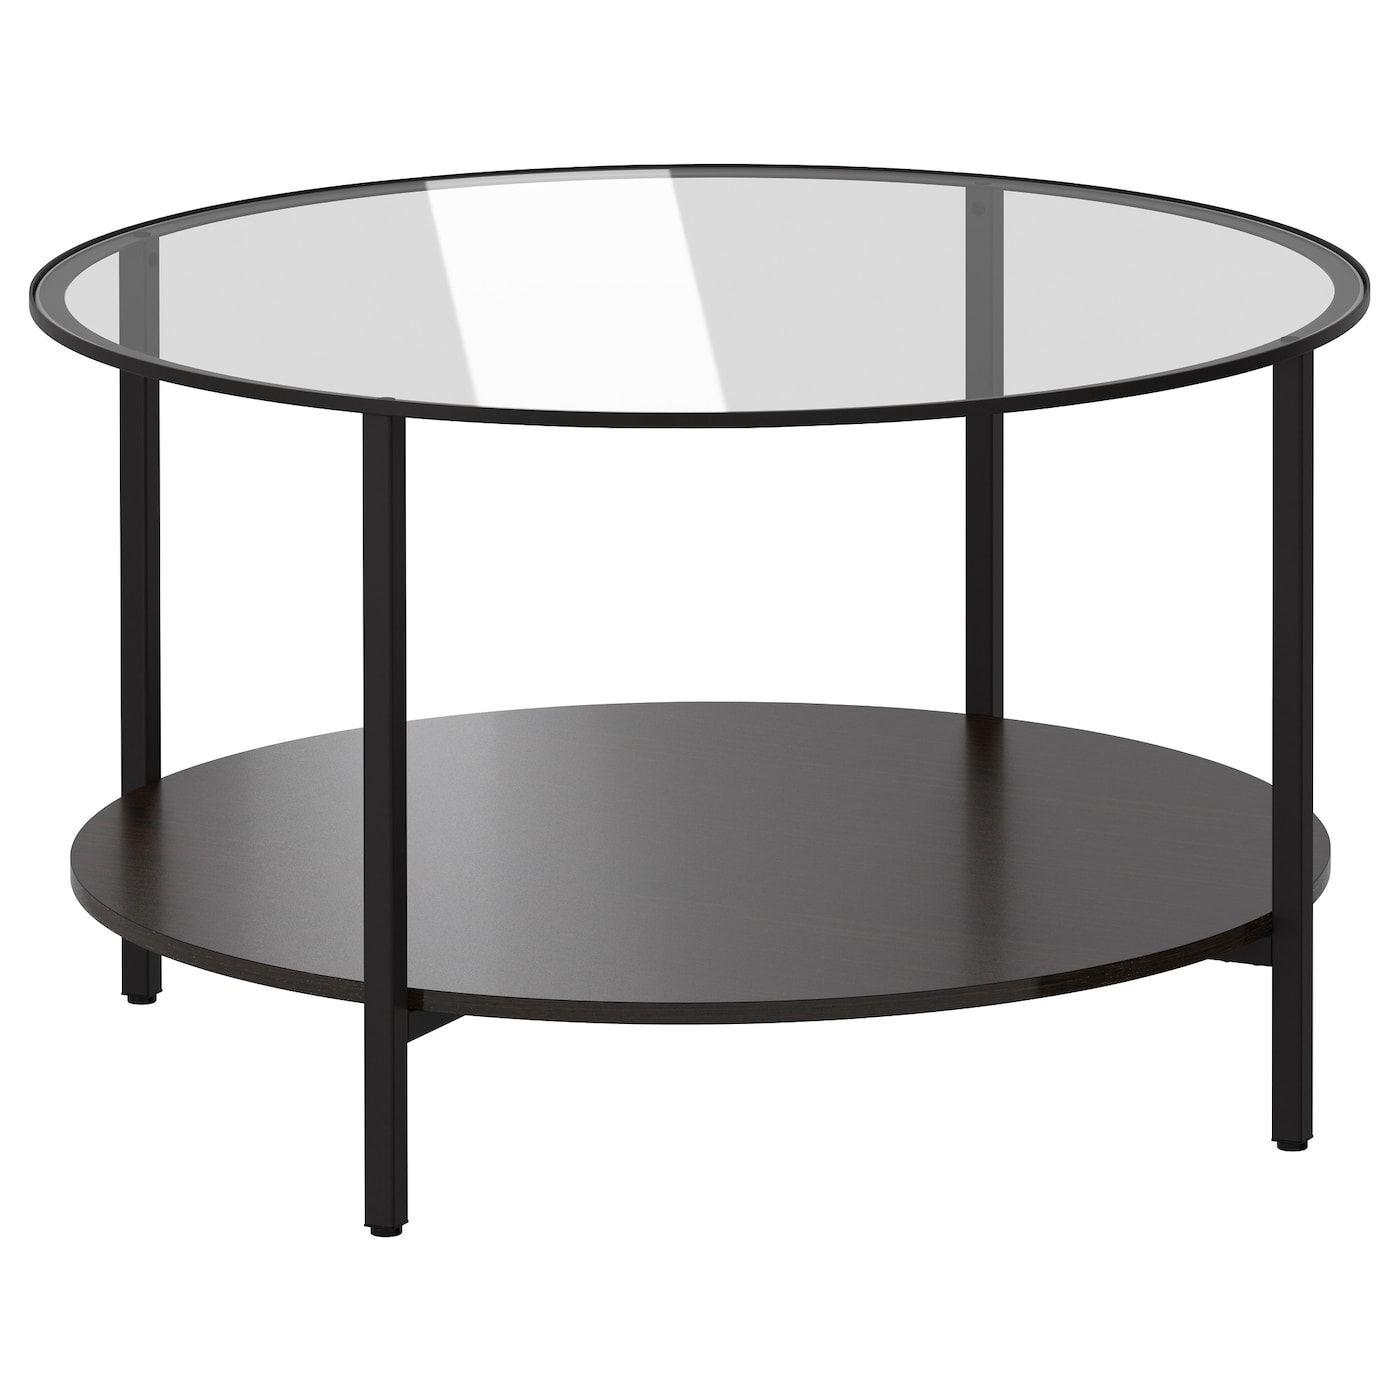 Vittsjo Black Brown Glass Coffee Table 75 Cm Ikea In 2021 Ikea Coffee Table Glass Coffee Table Glass Side Tables [ 1400 x 1400 Pixel ]